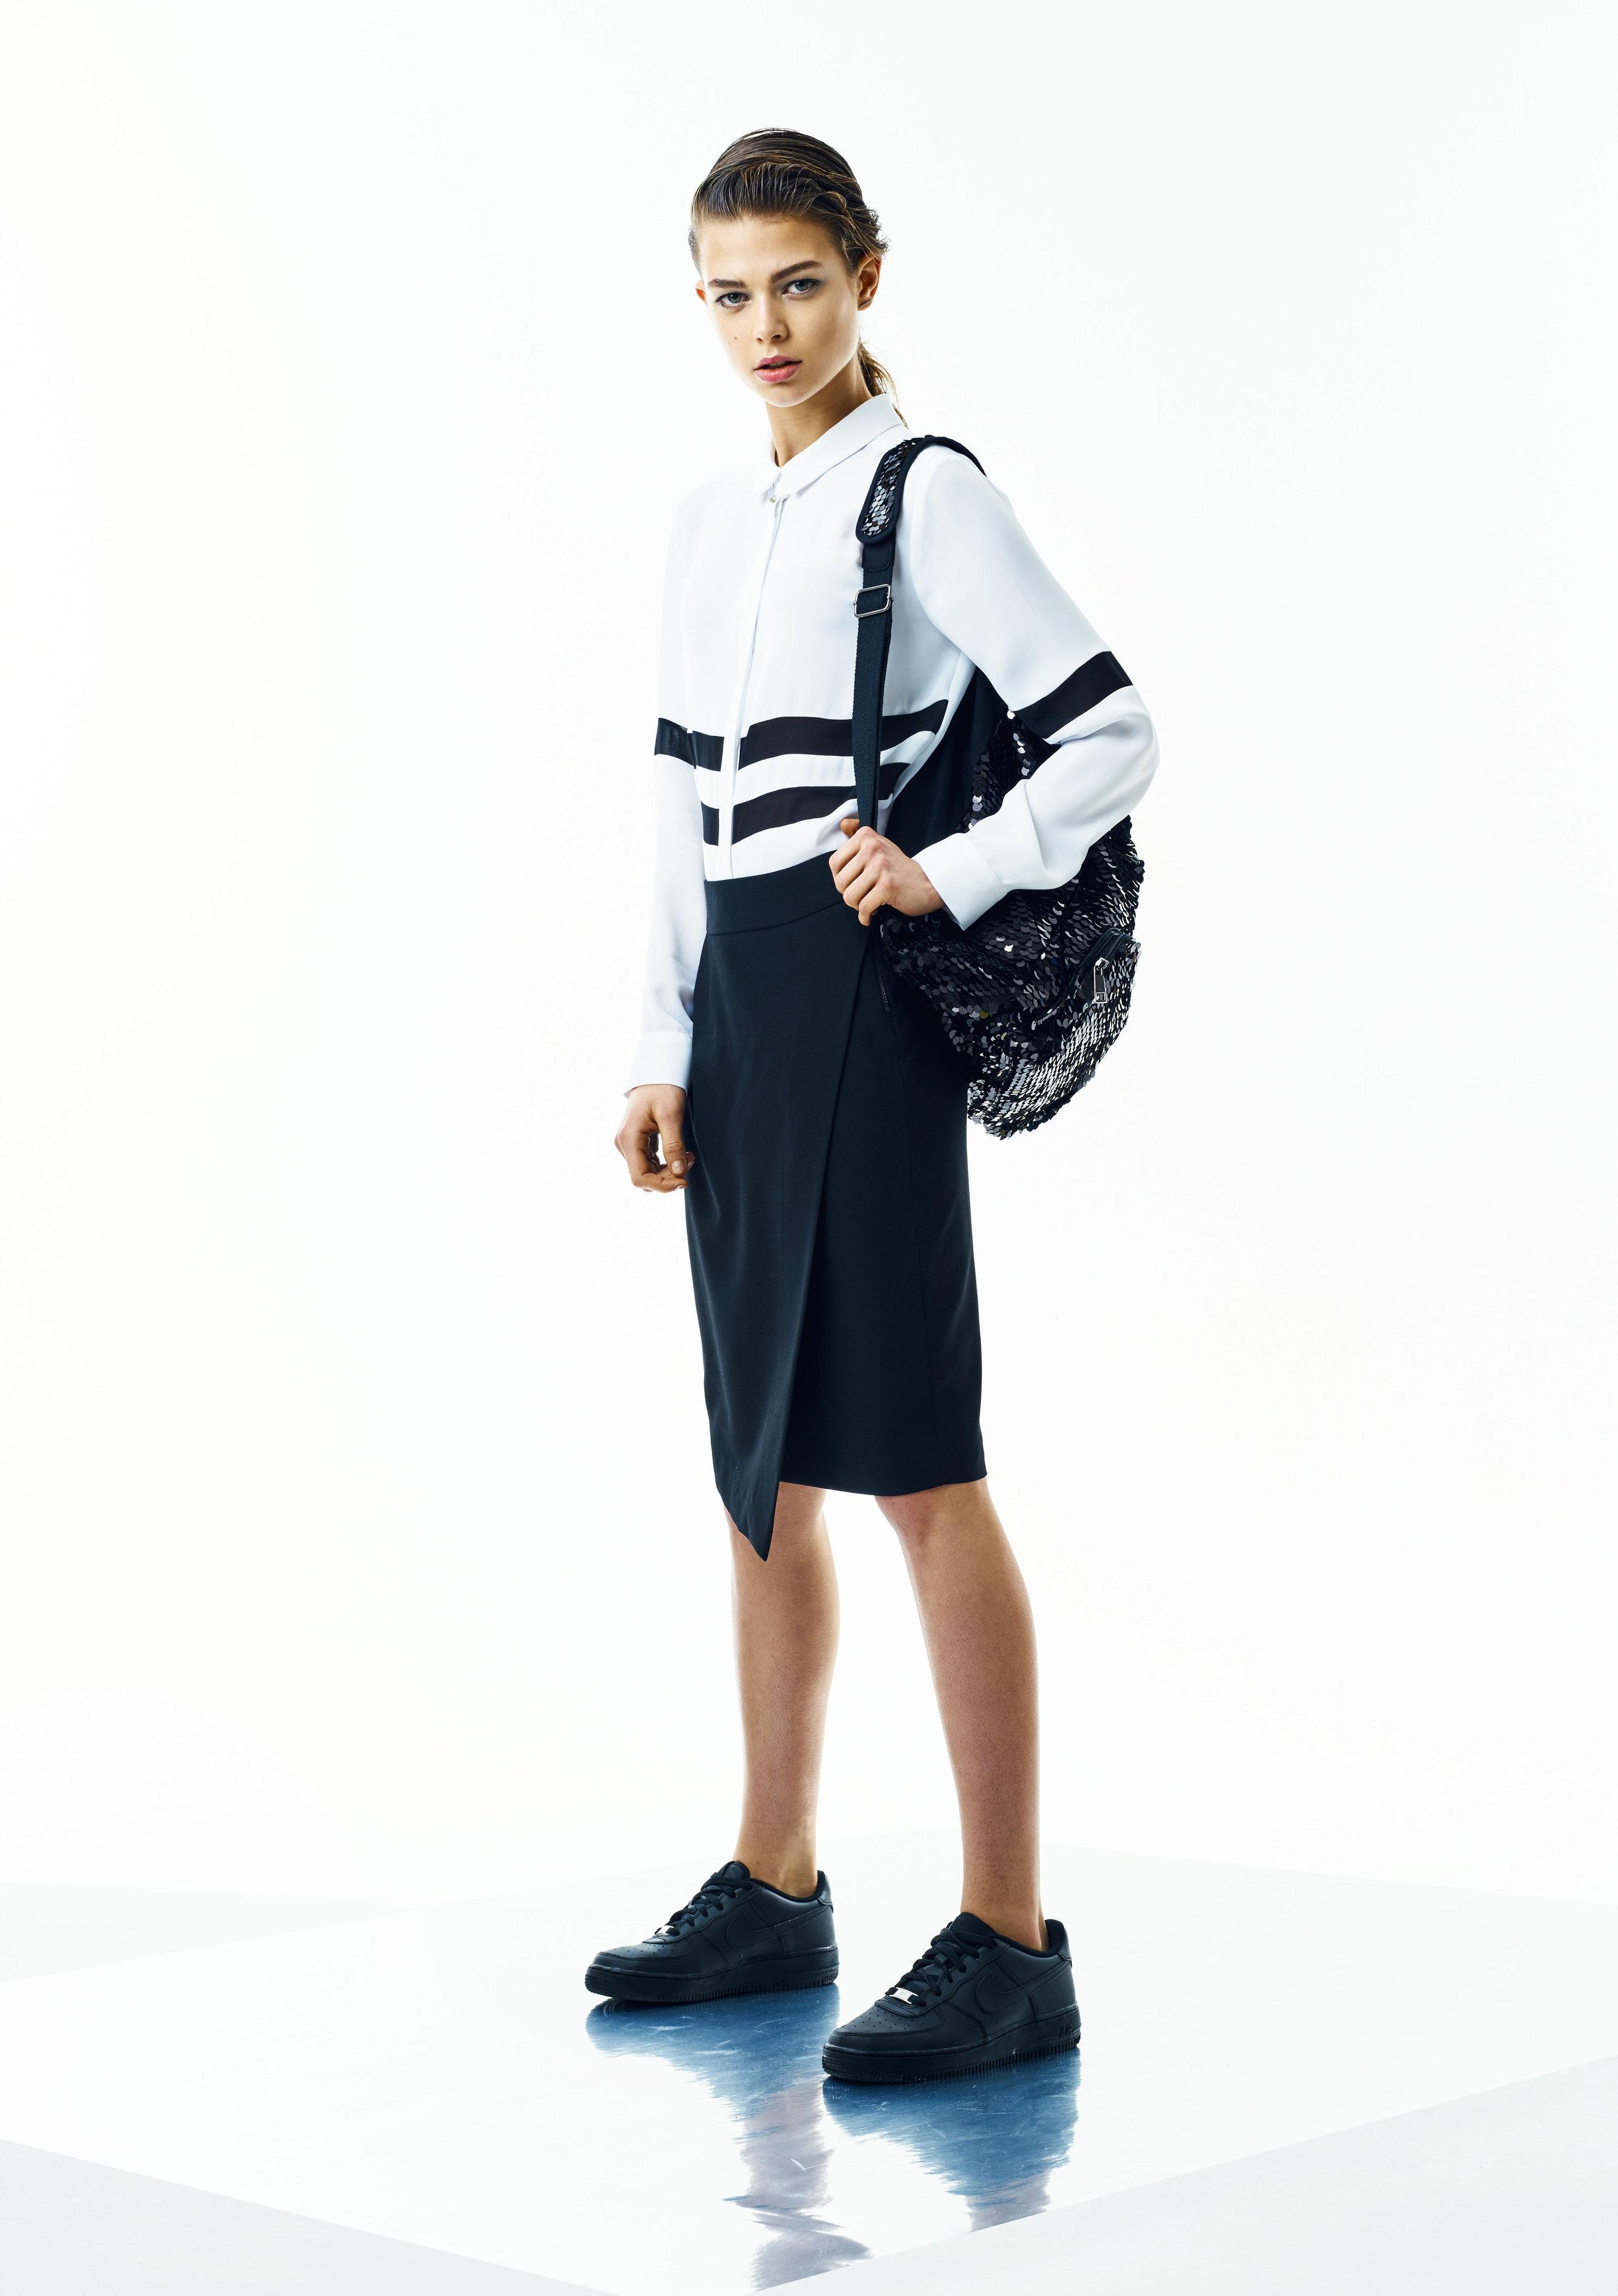 Blouse, Steffen Schraut; skirt, Wunderwerk; backpack,CeNoir;necklace,Yael;shoes, Nike